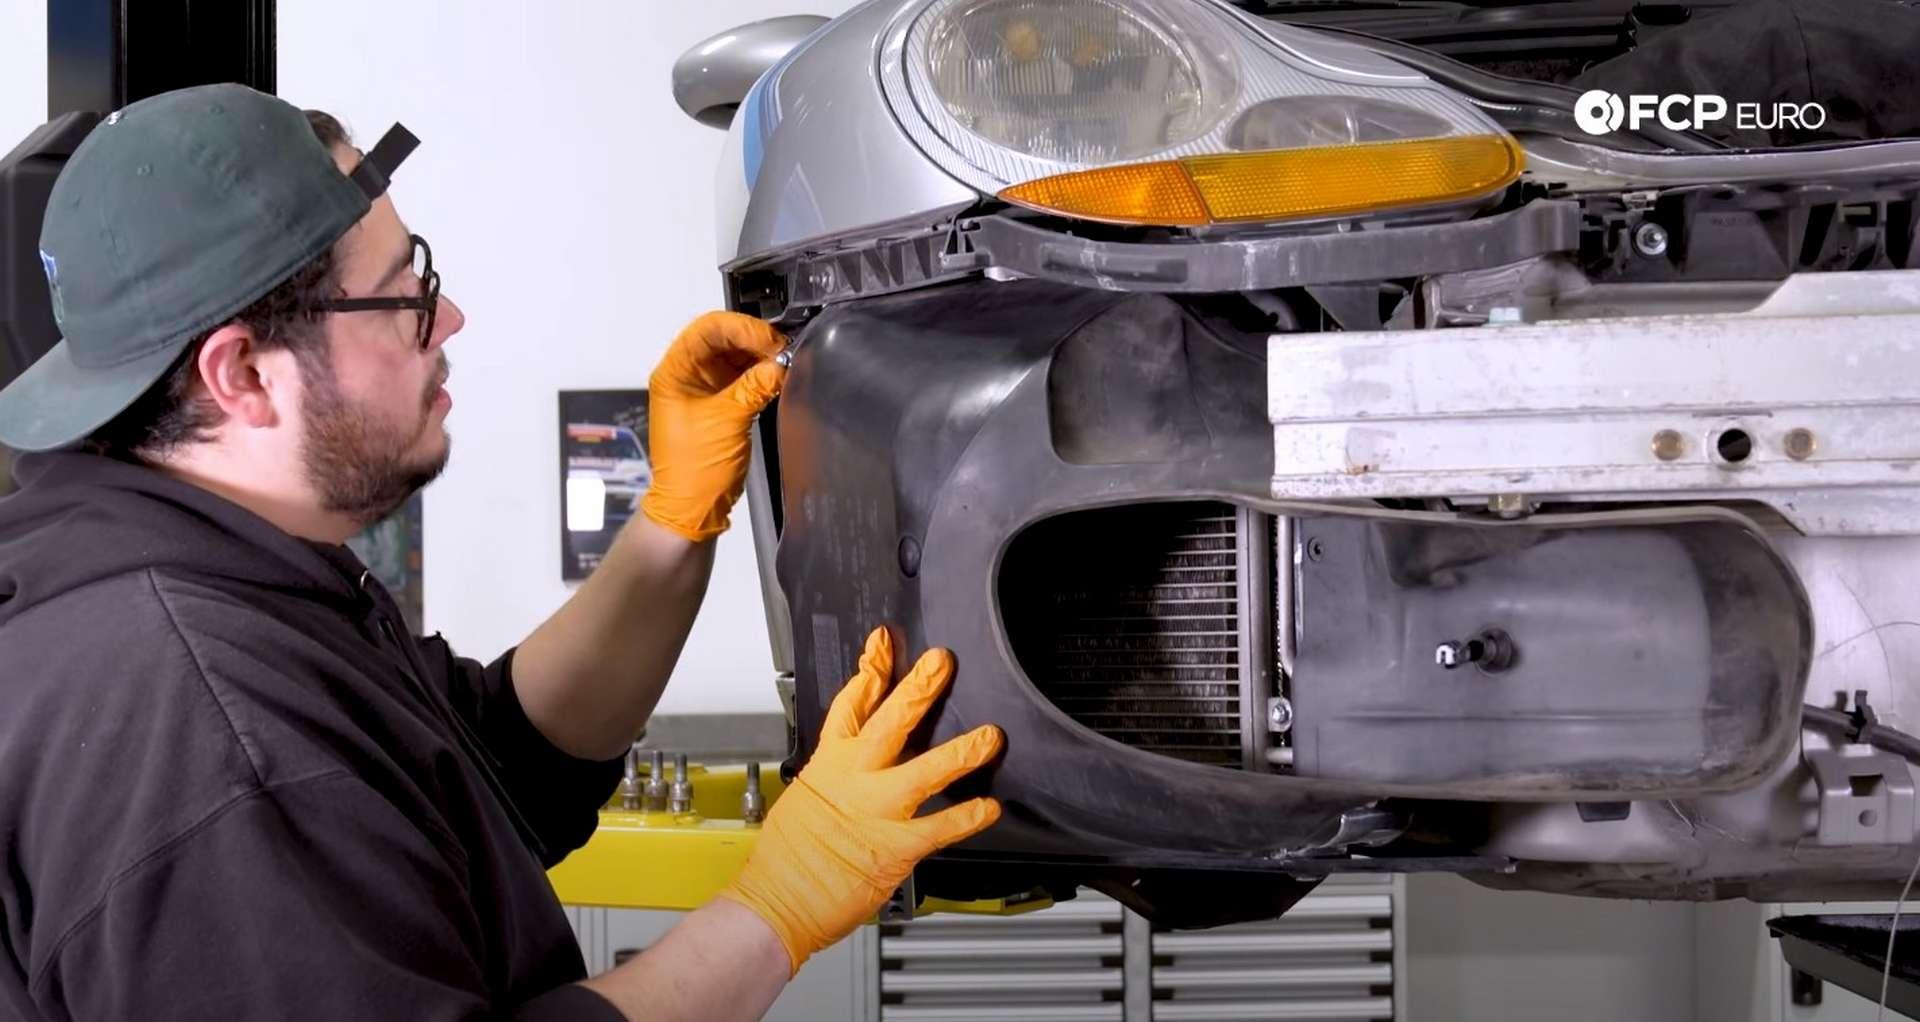 DIY Porsche 996 Radiator Replacement refitting the ducting